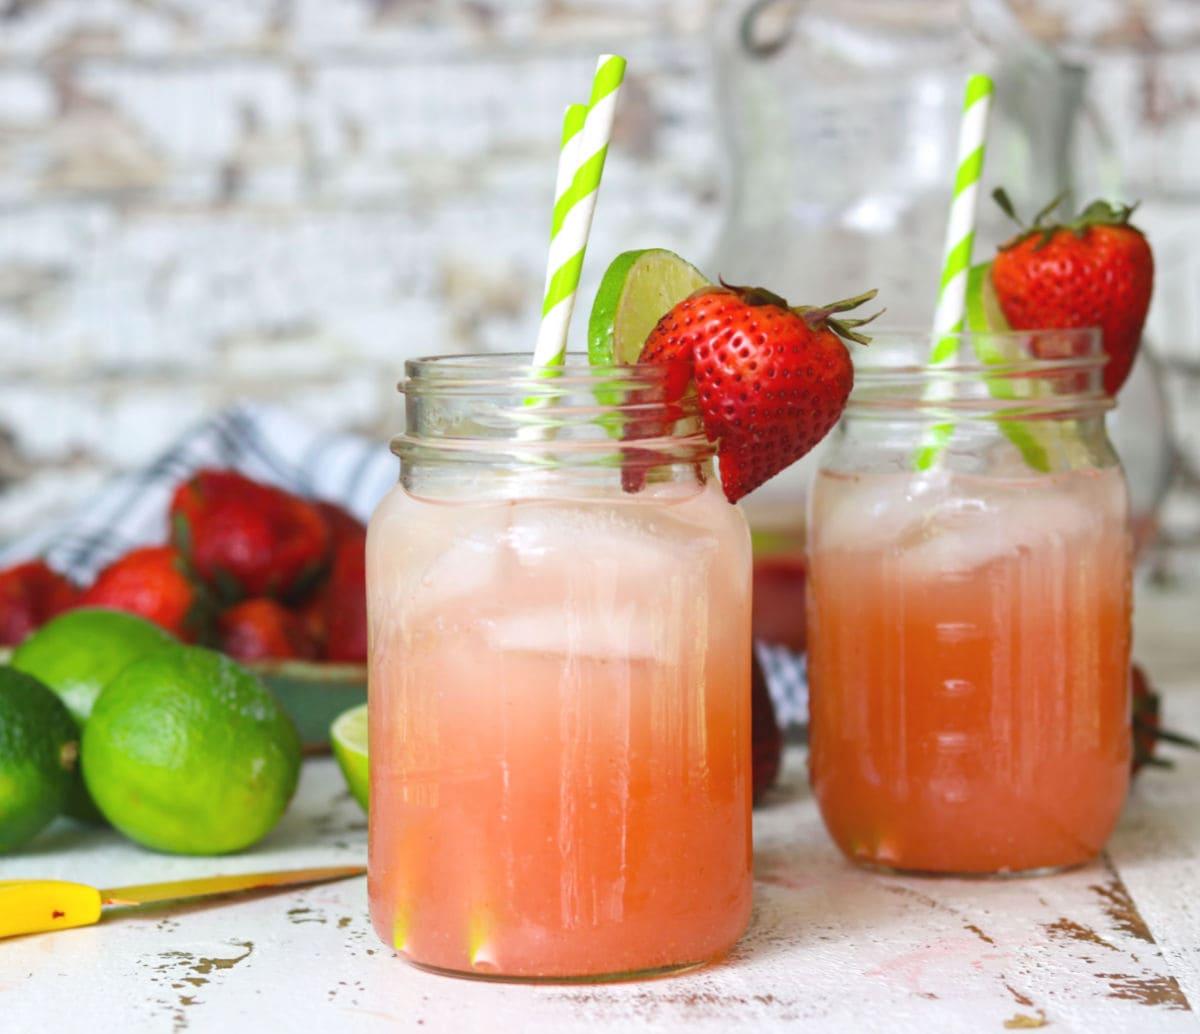 Two Mason jars of strawberry vodka lemonade ready to drink.